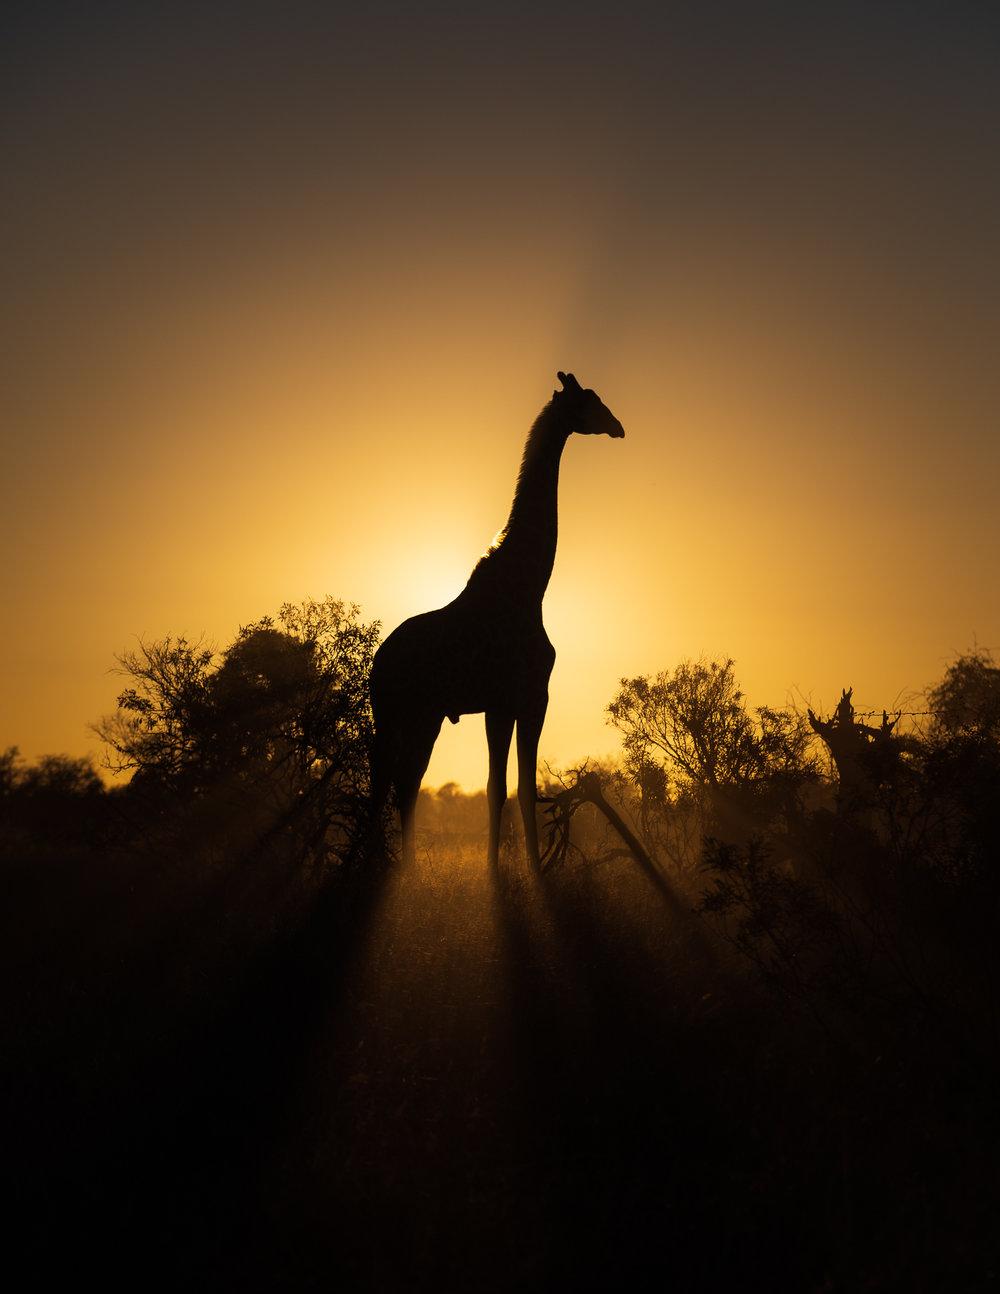 Afrika in één oogopslag?